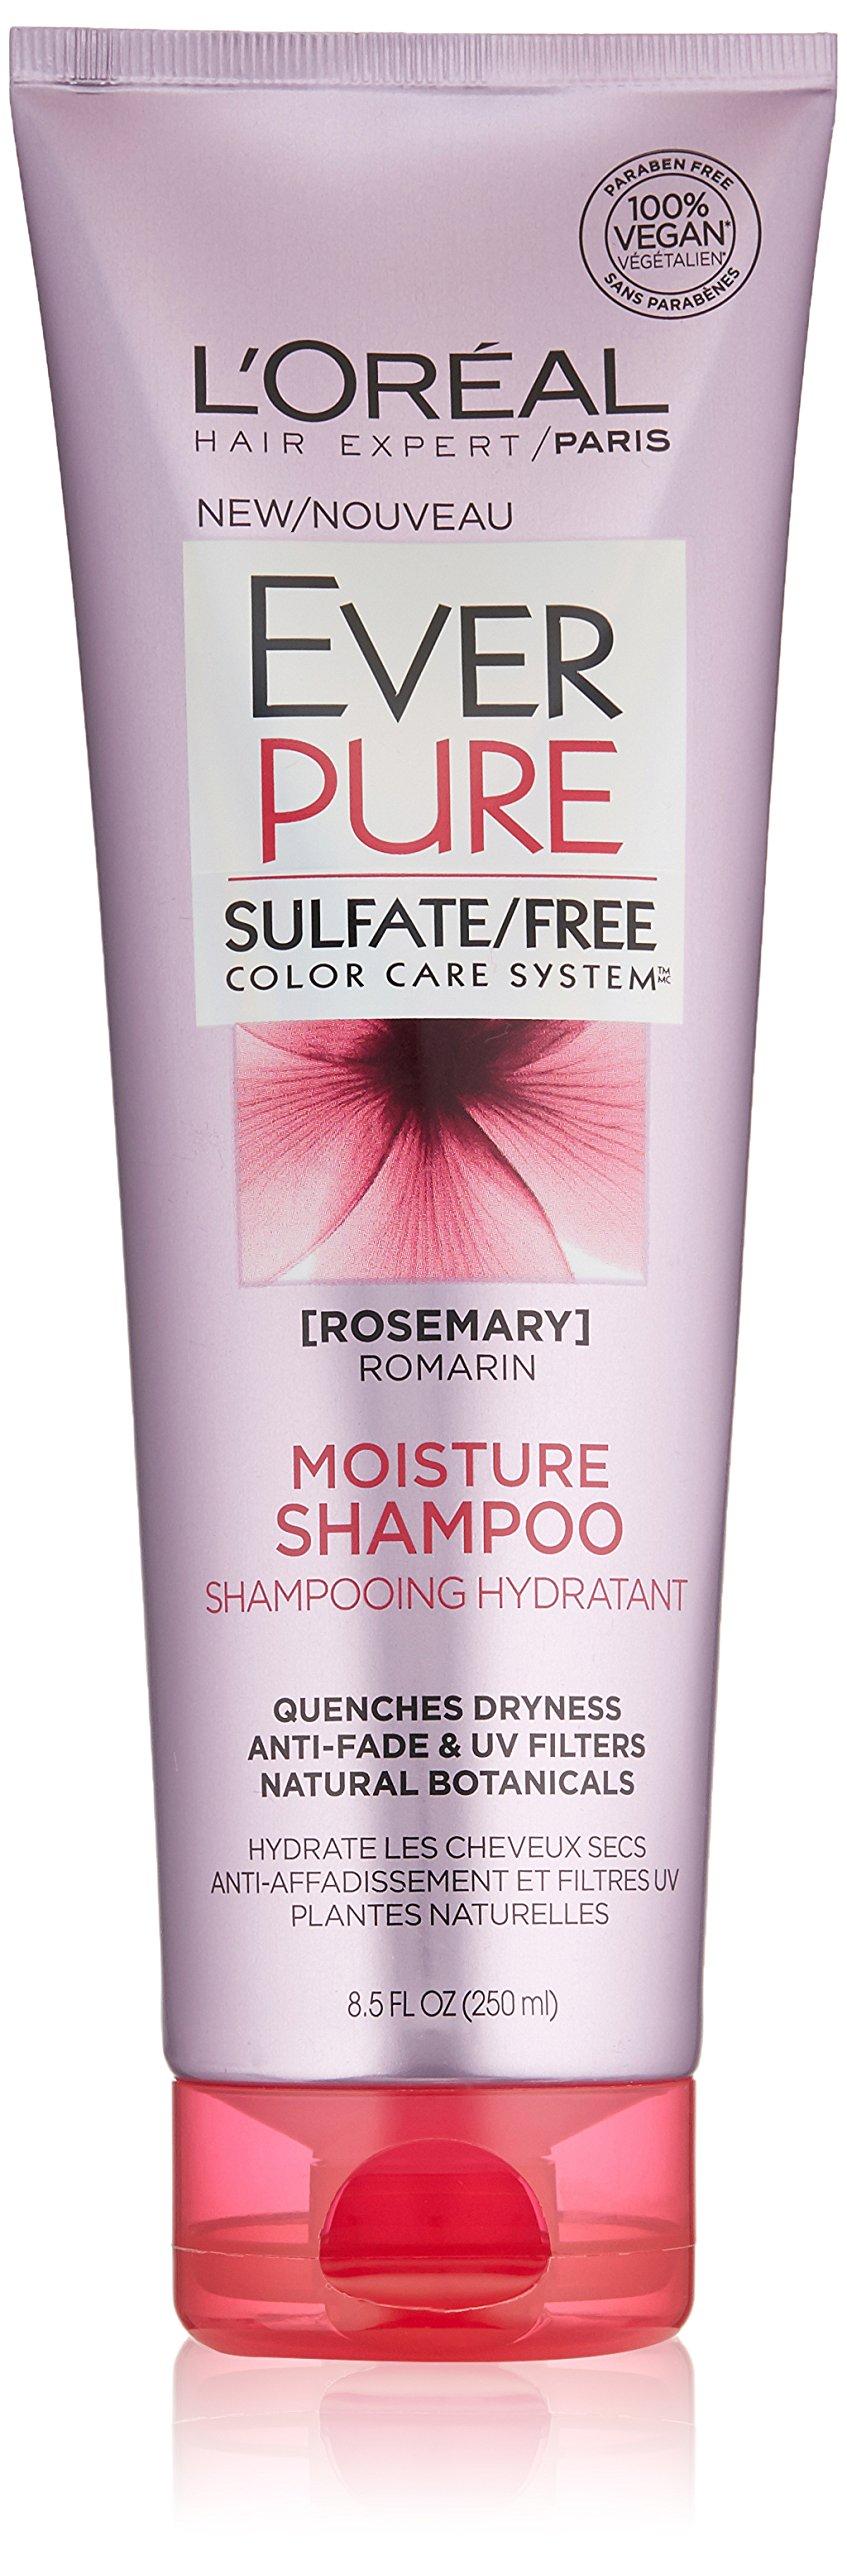 L'Oréal Paris EverPure Sulfate Free Moisture Shampoo, 8.5 fl. oz.